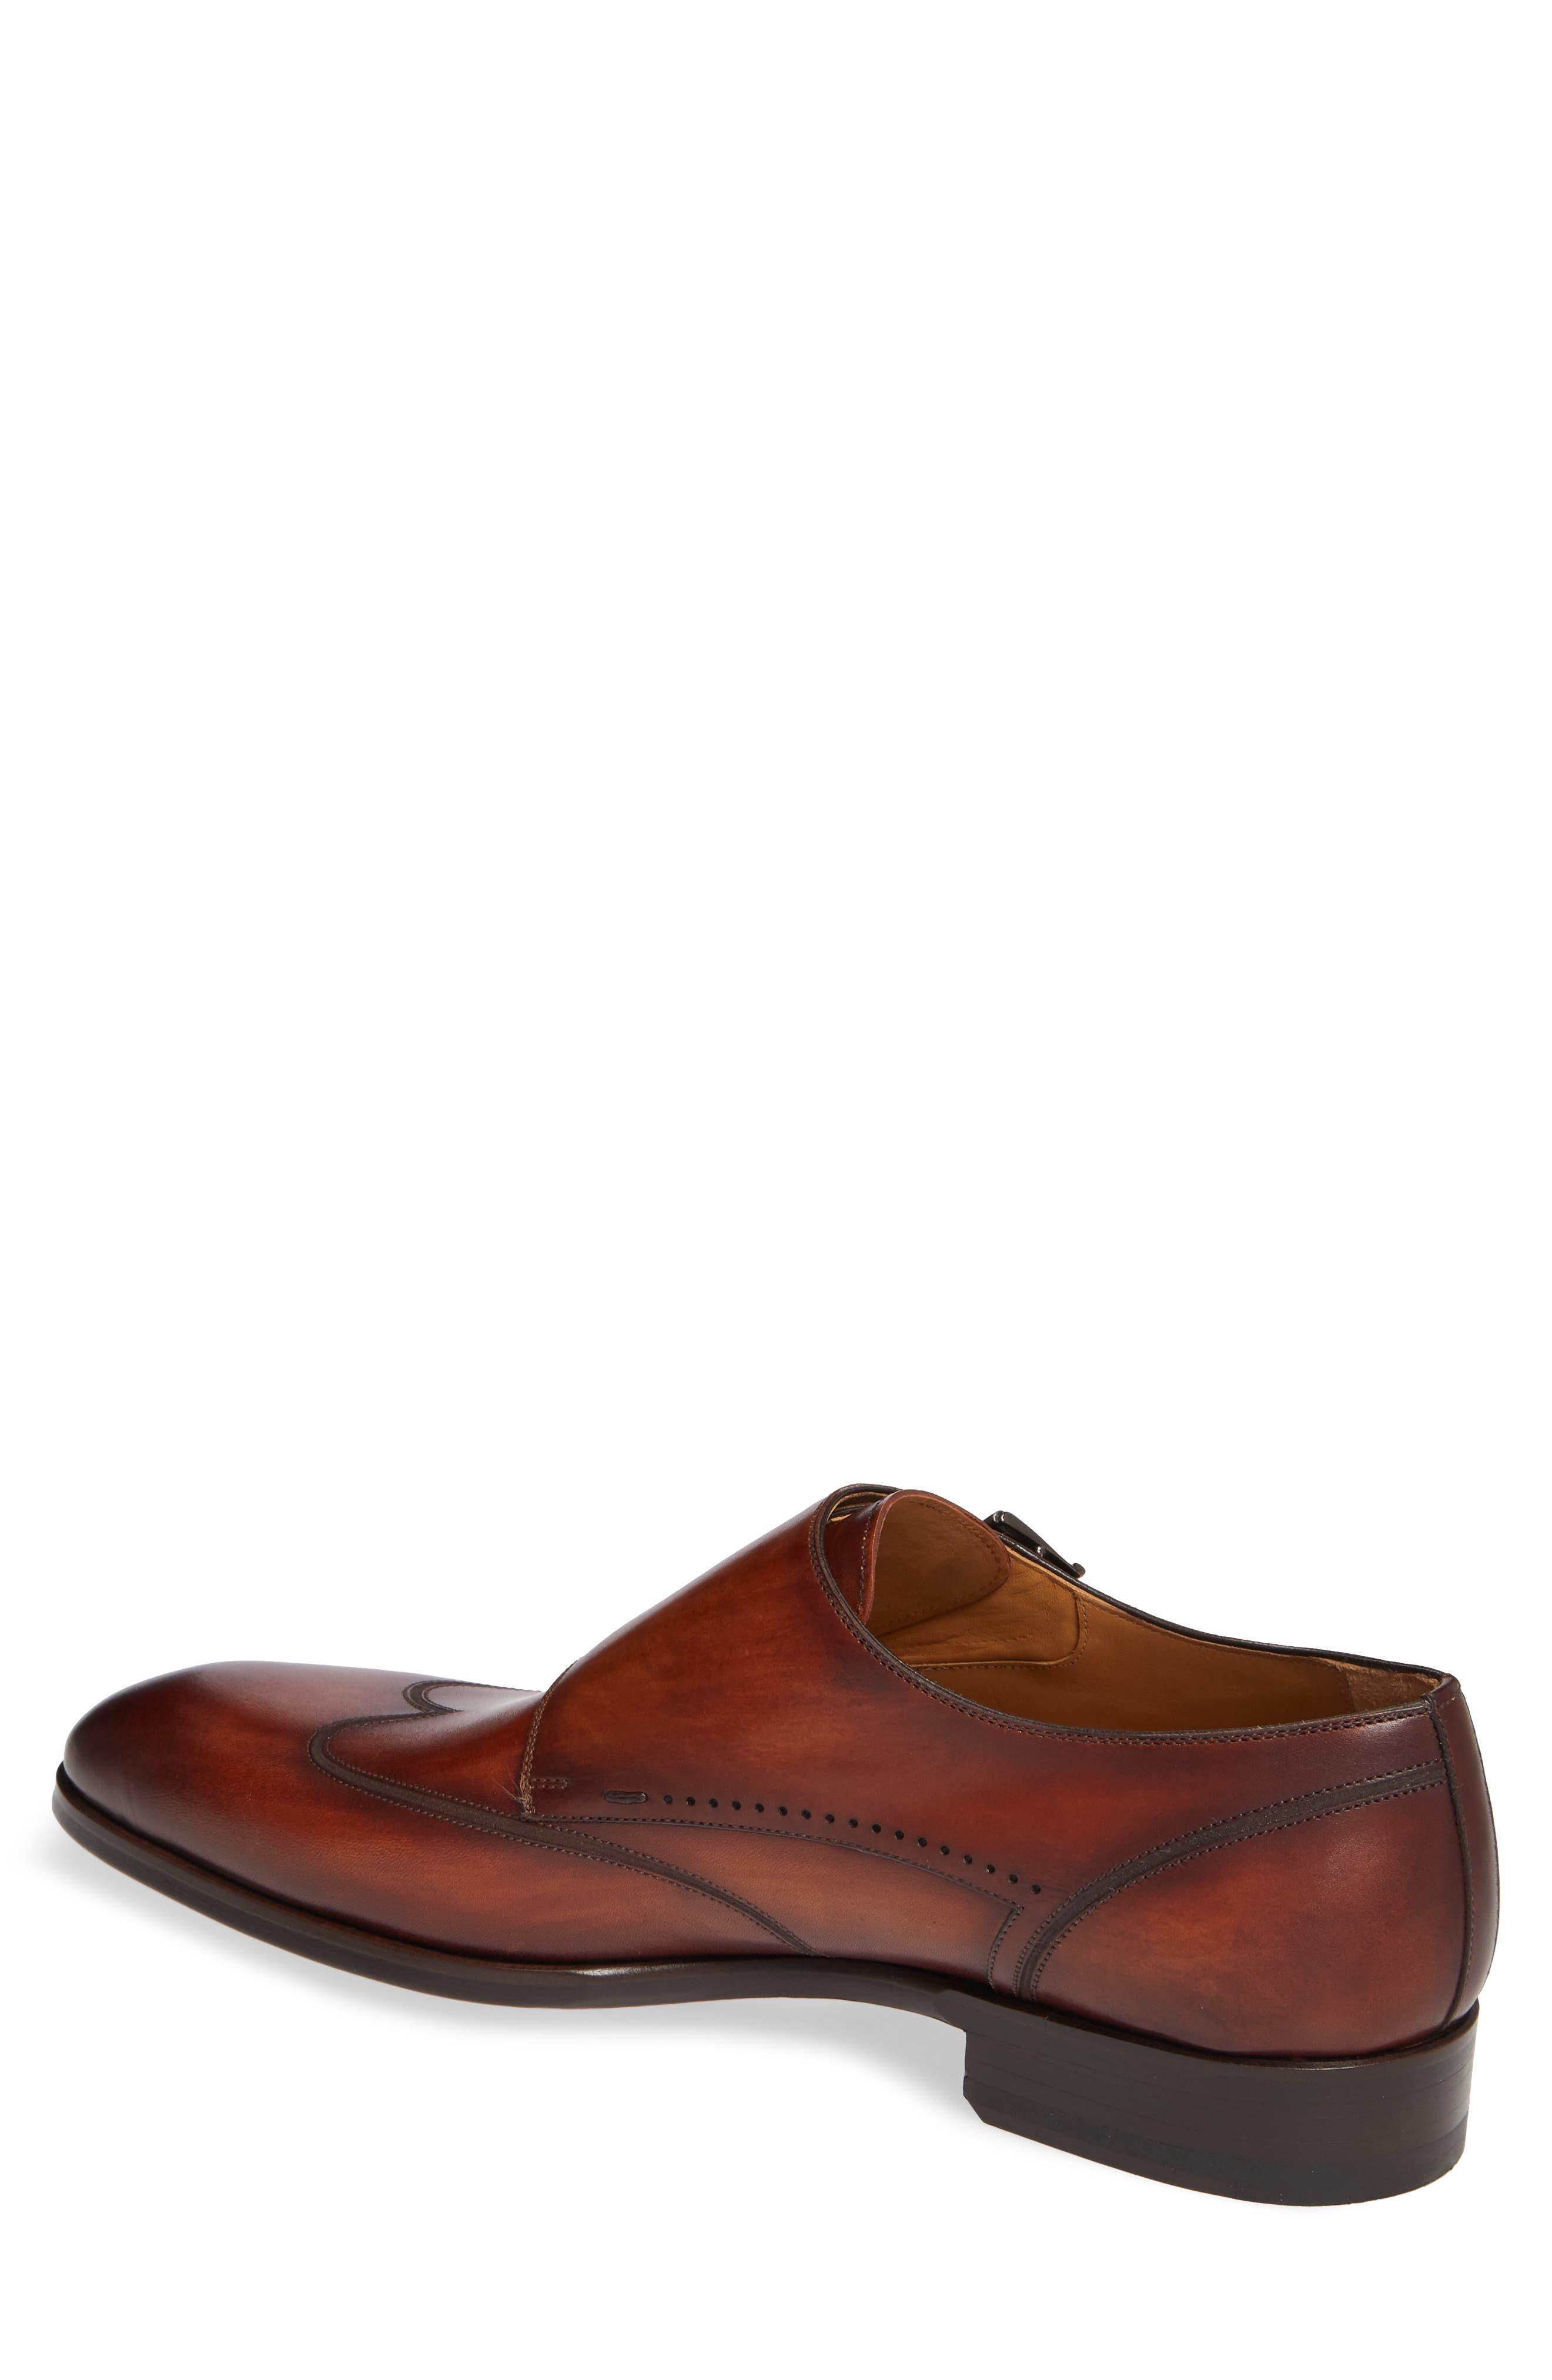 Camden Double Monk Strap Shoe,                             Alternate thumbnail 2, color,                             202